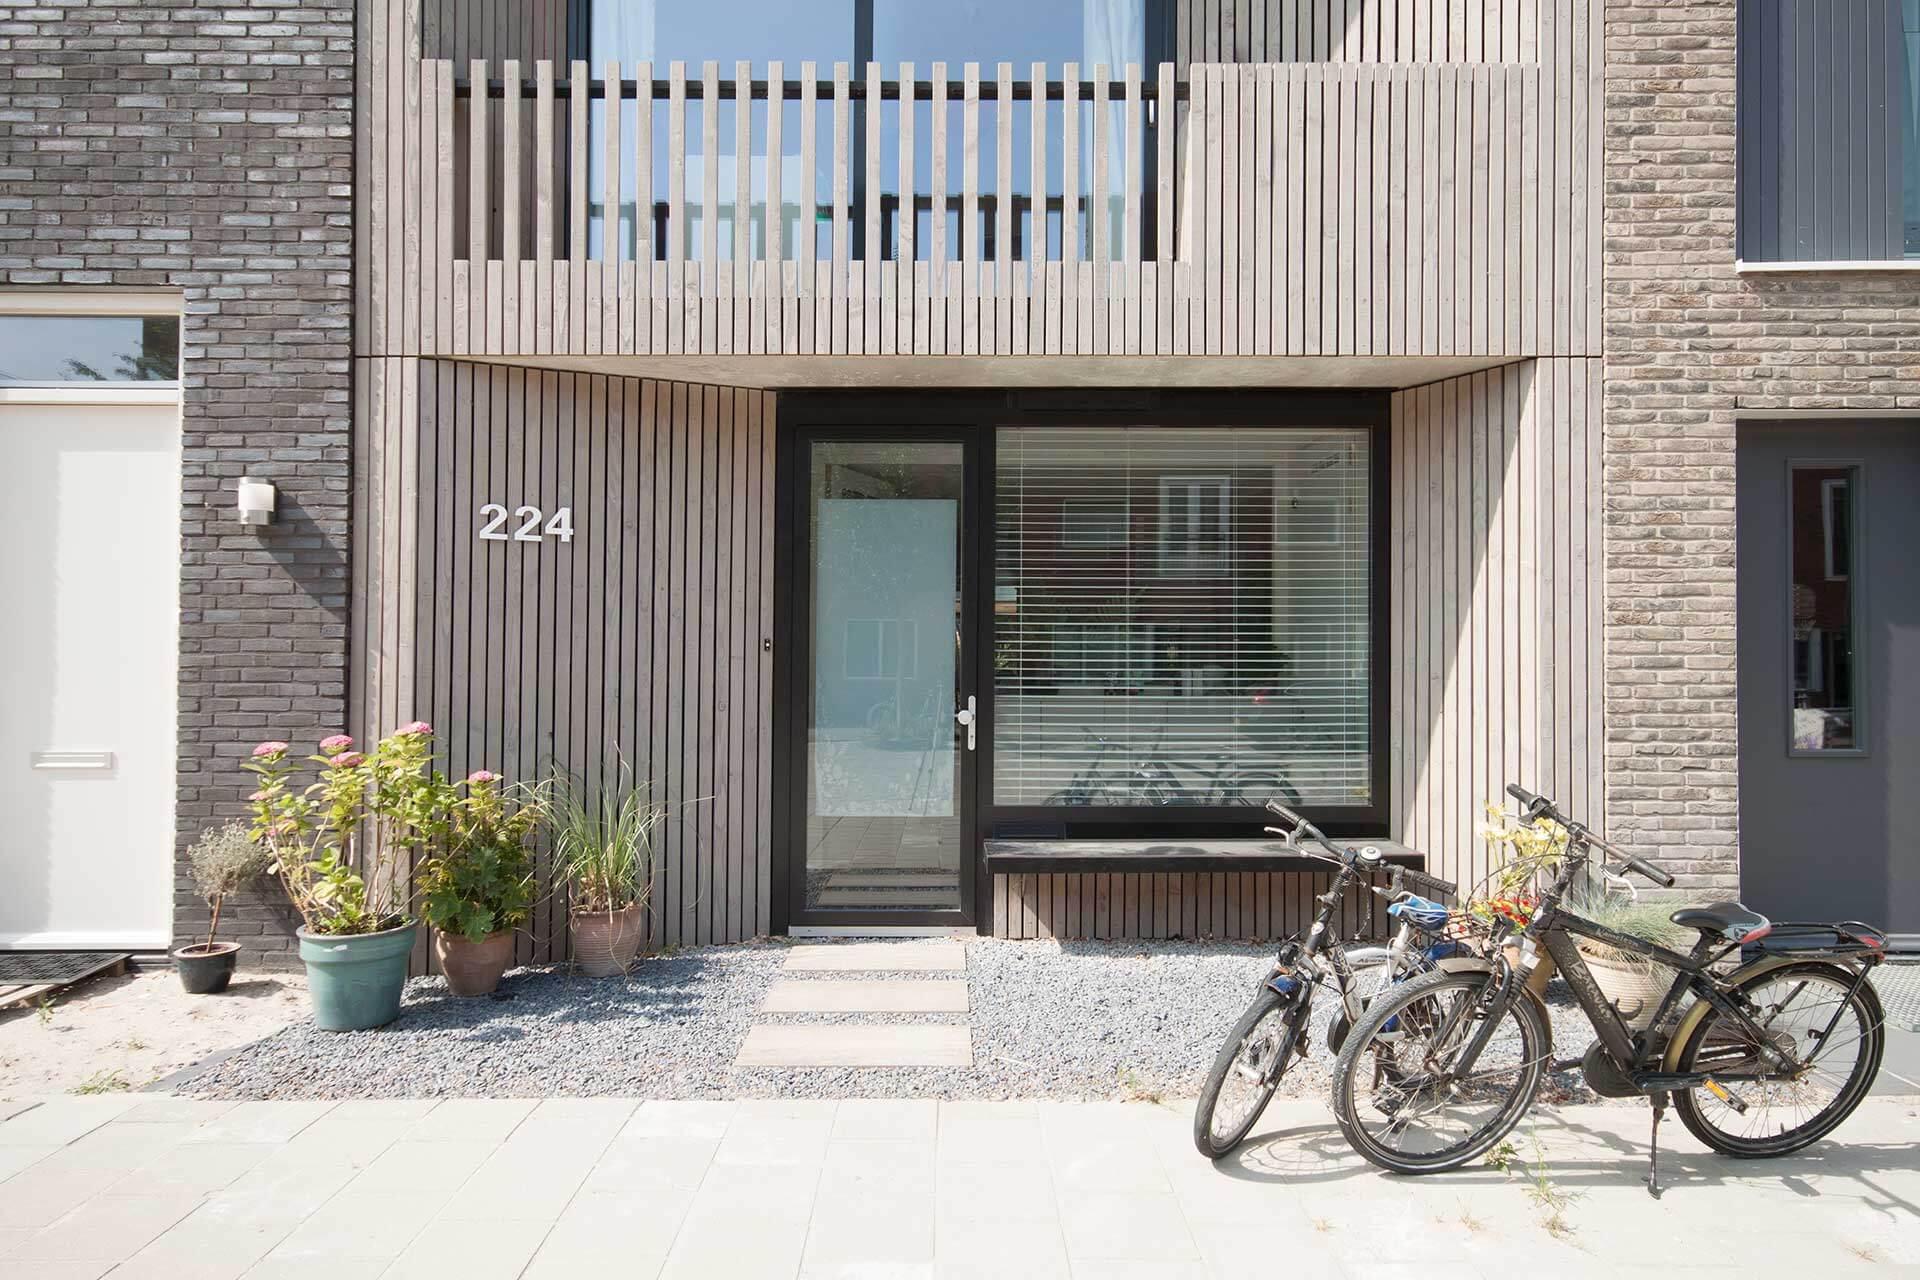 8A-Architecten-loggia-house-amsterdam-ijburg-03